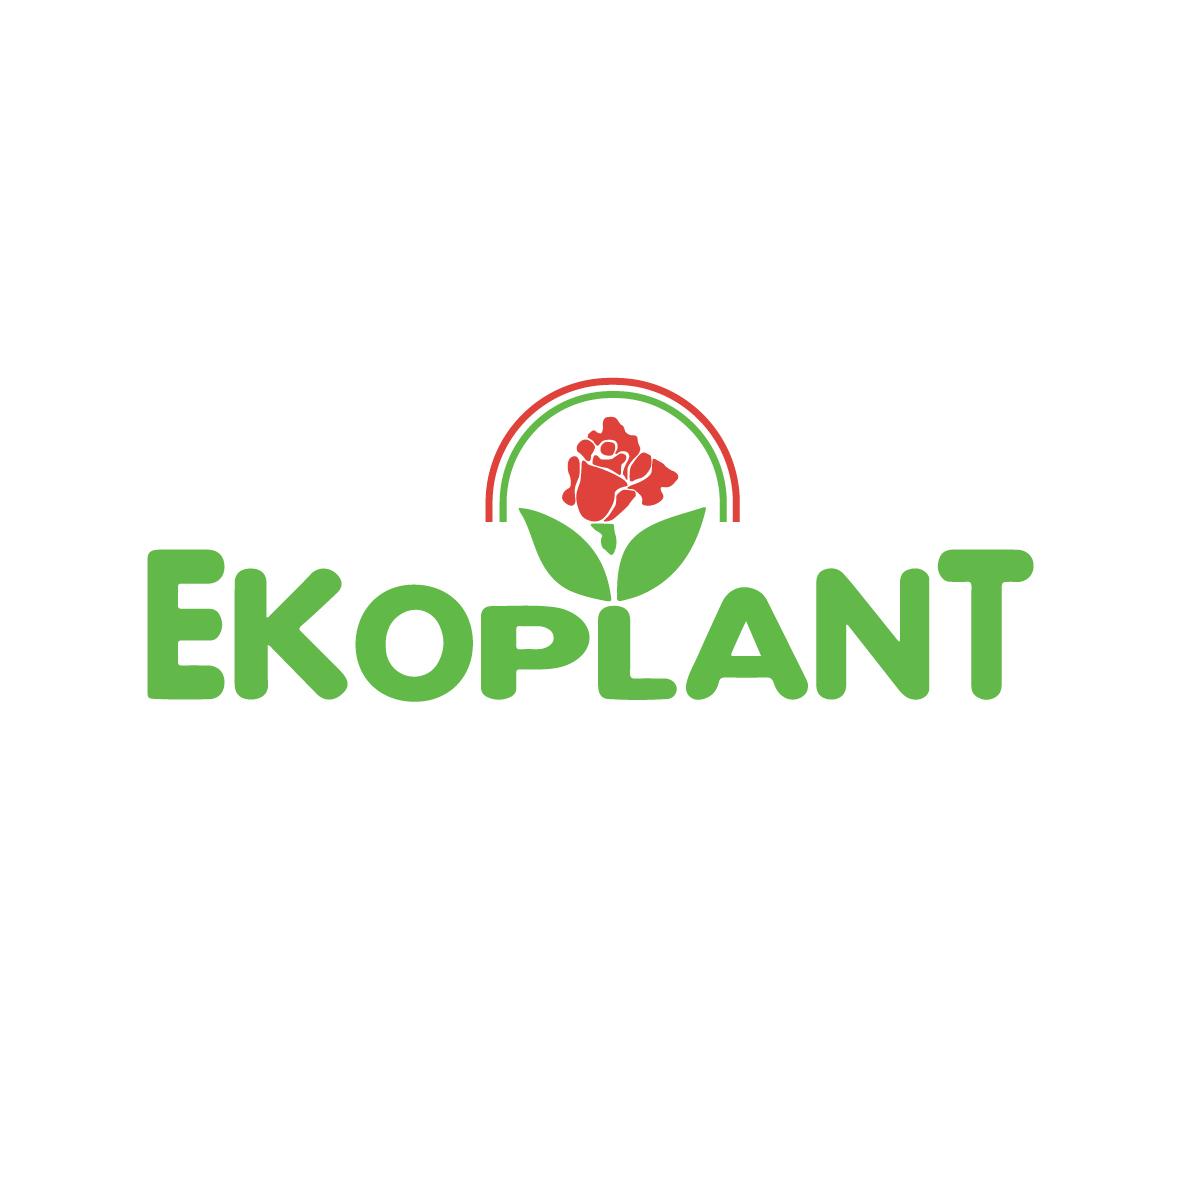 Ekoplant